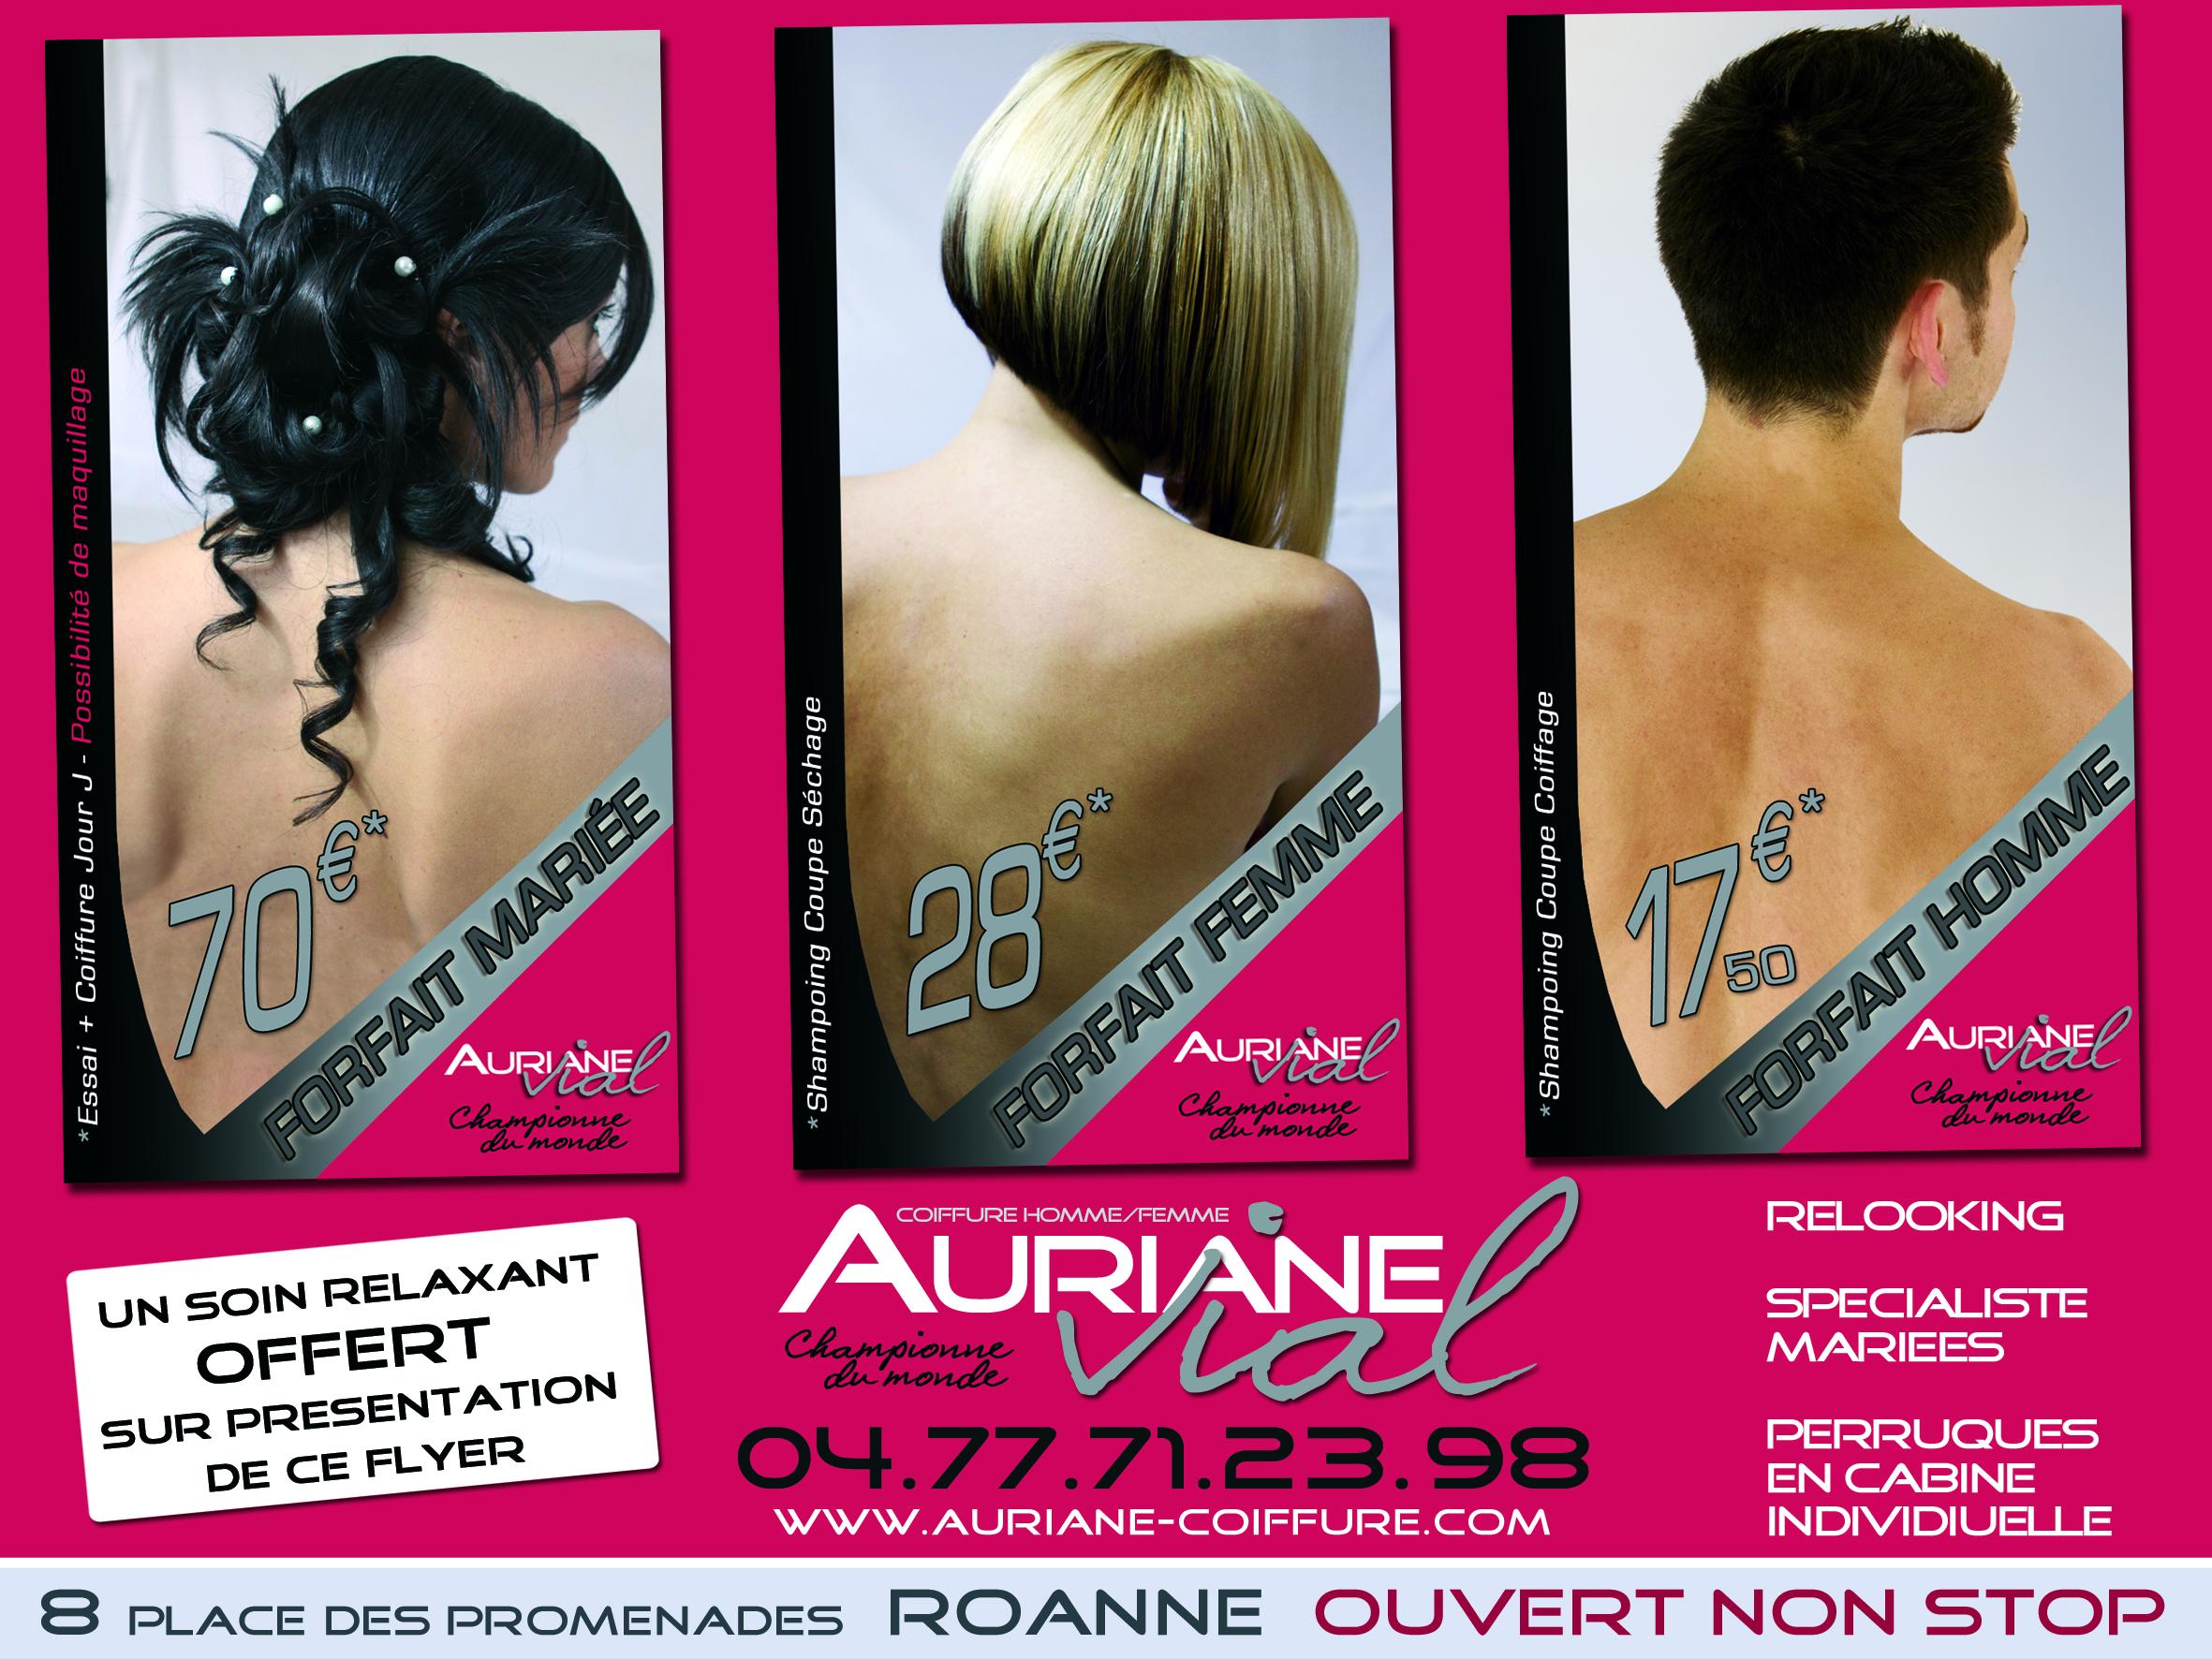 Vial auriane roanne avis tarifs horaires t l phone for Salon coiffure roanne